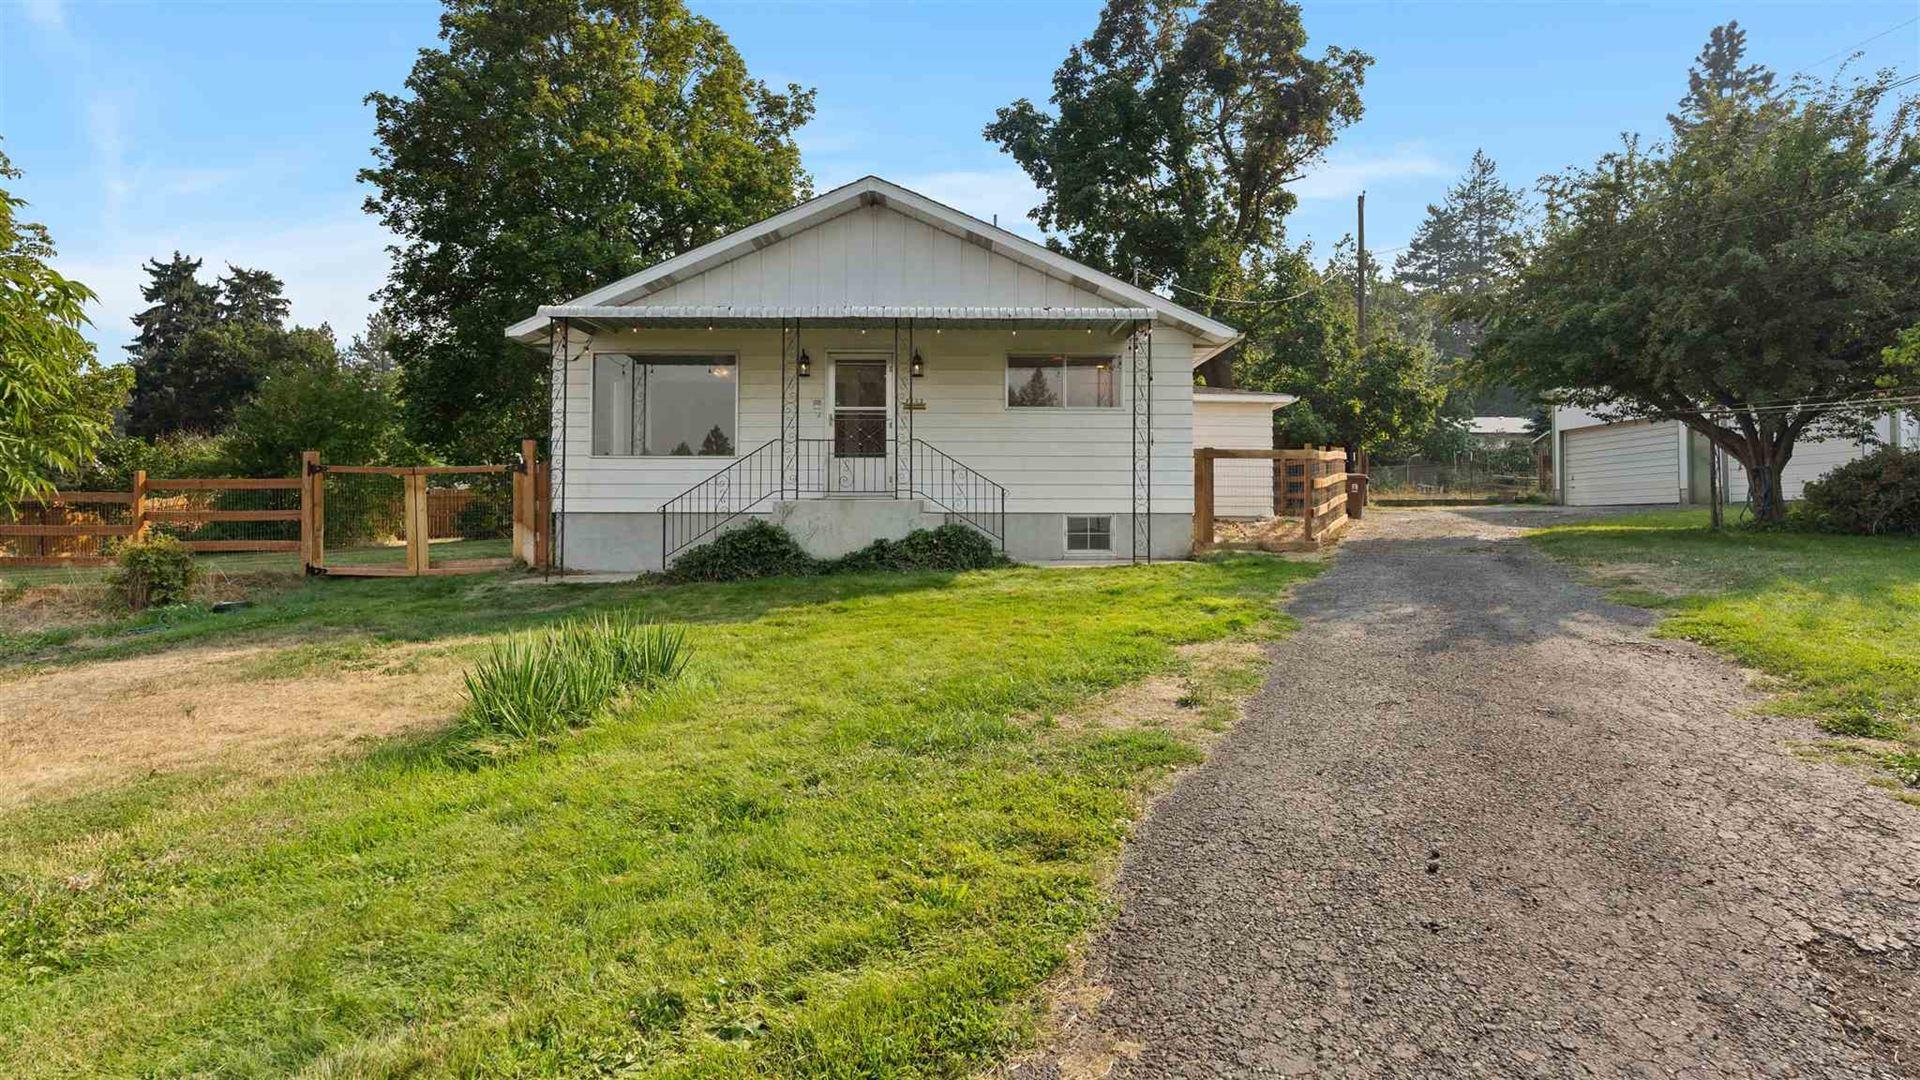 1212 S Ray St, Spokane, WA 99202-5446 - #: 202122000